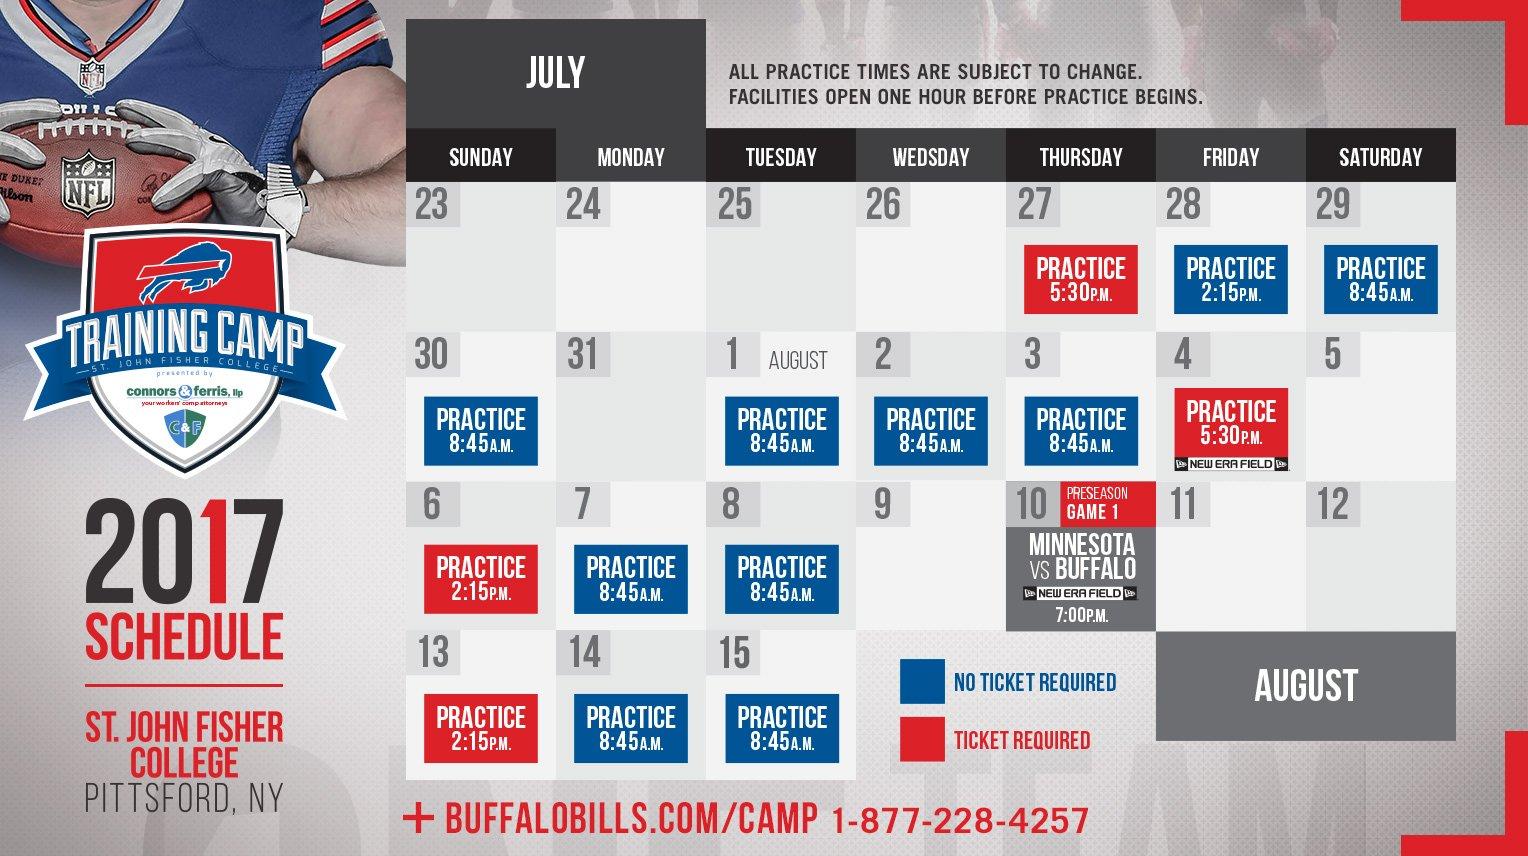 Buffalo bills release 2017 training camp schedule buffalo rumblings - Buffalo bills ticket office ...